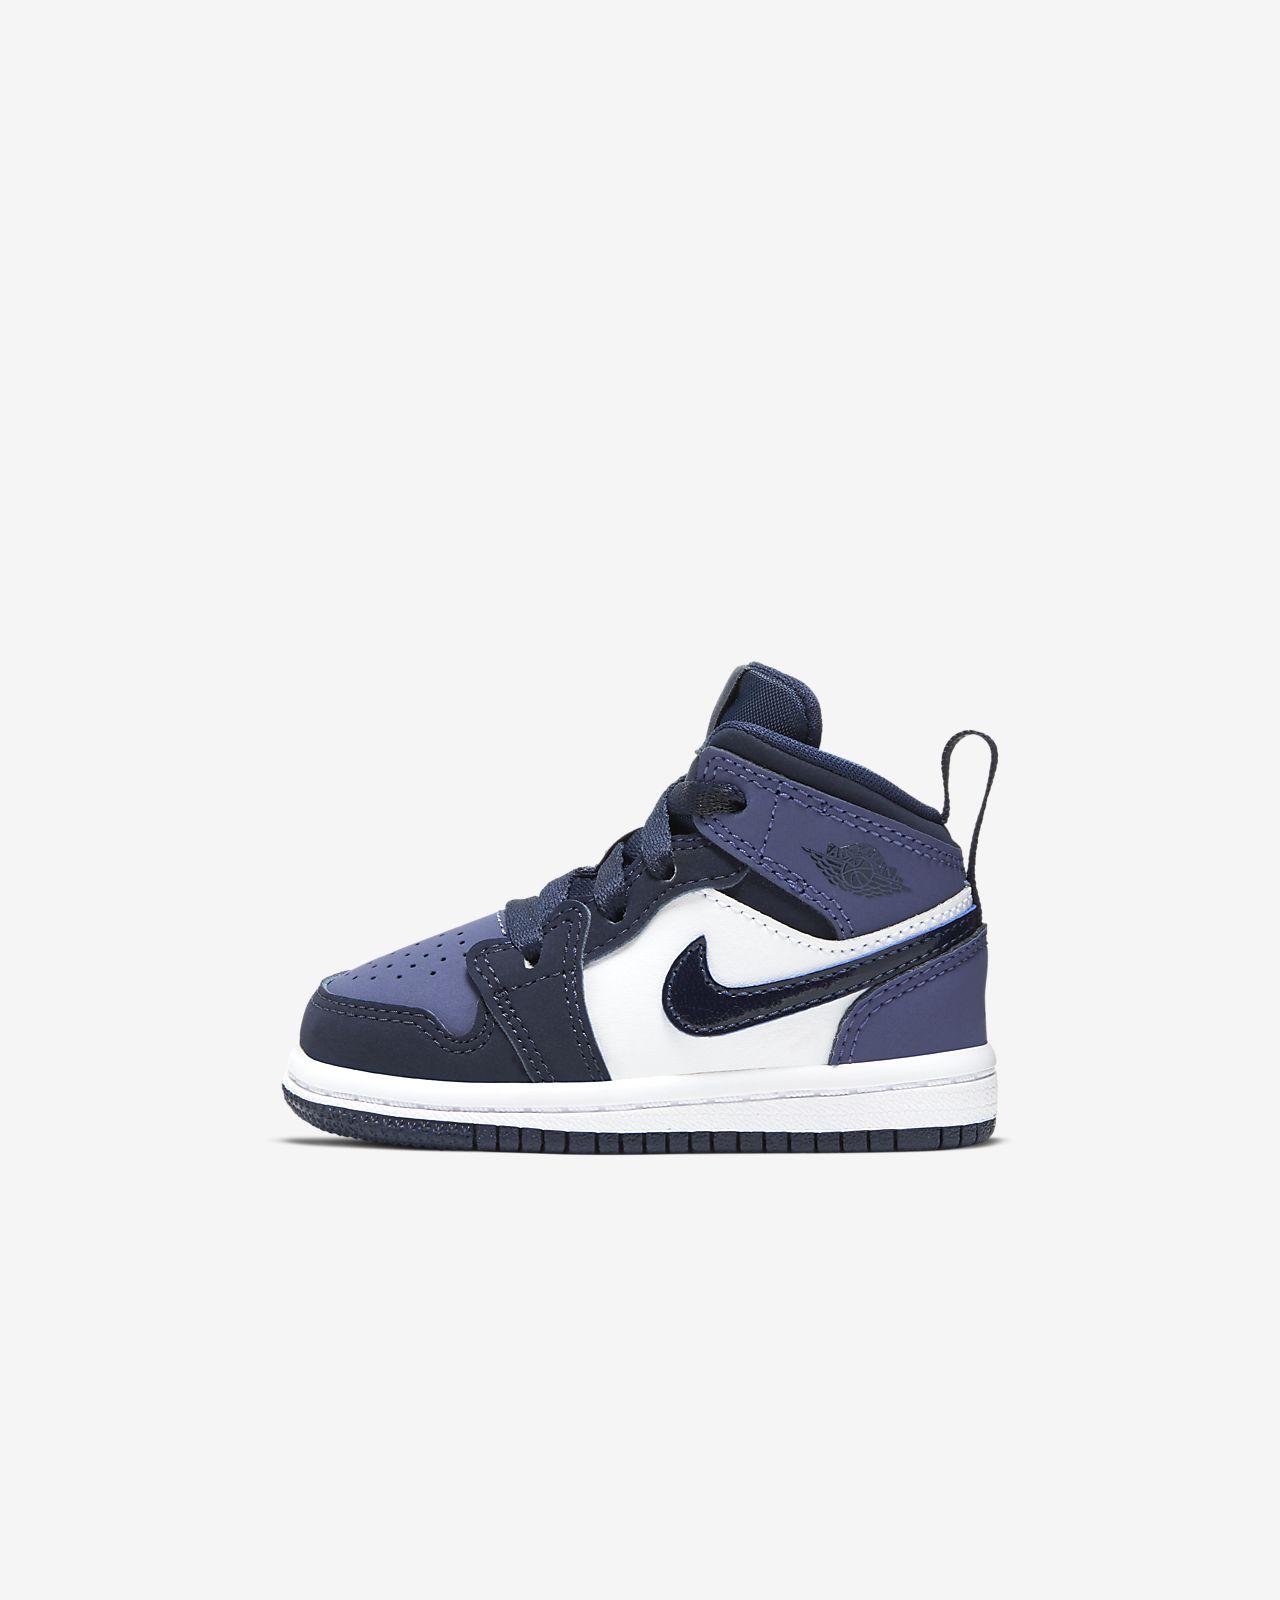 Air Jordan 1 Mid Baby & Toddler Shoe